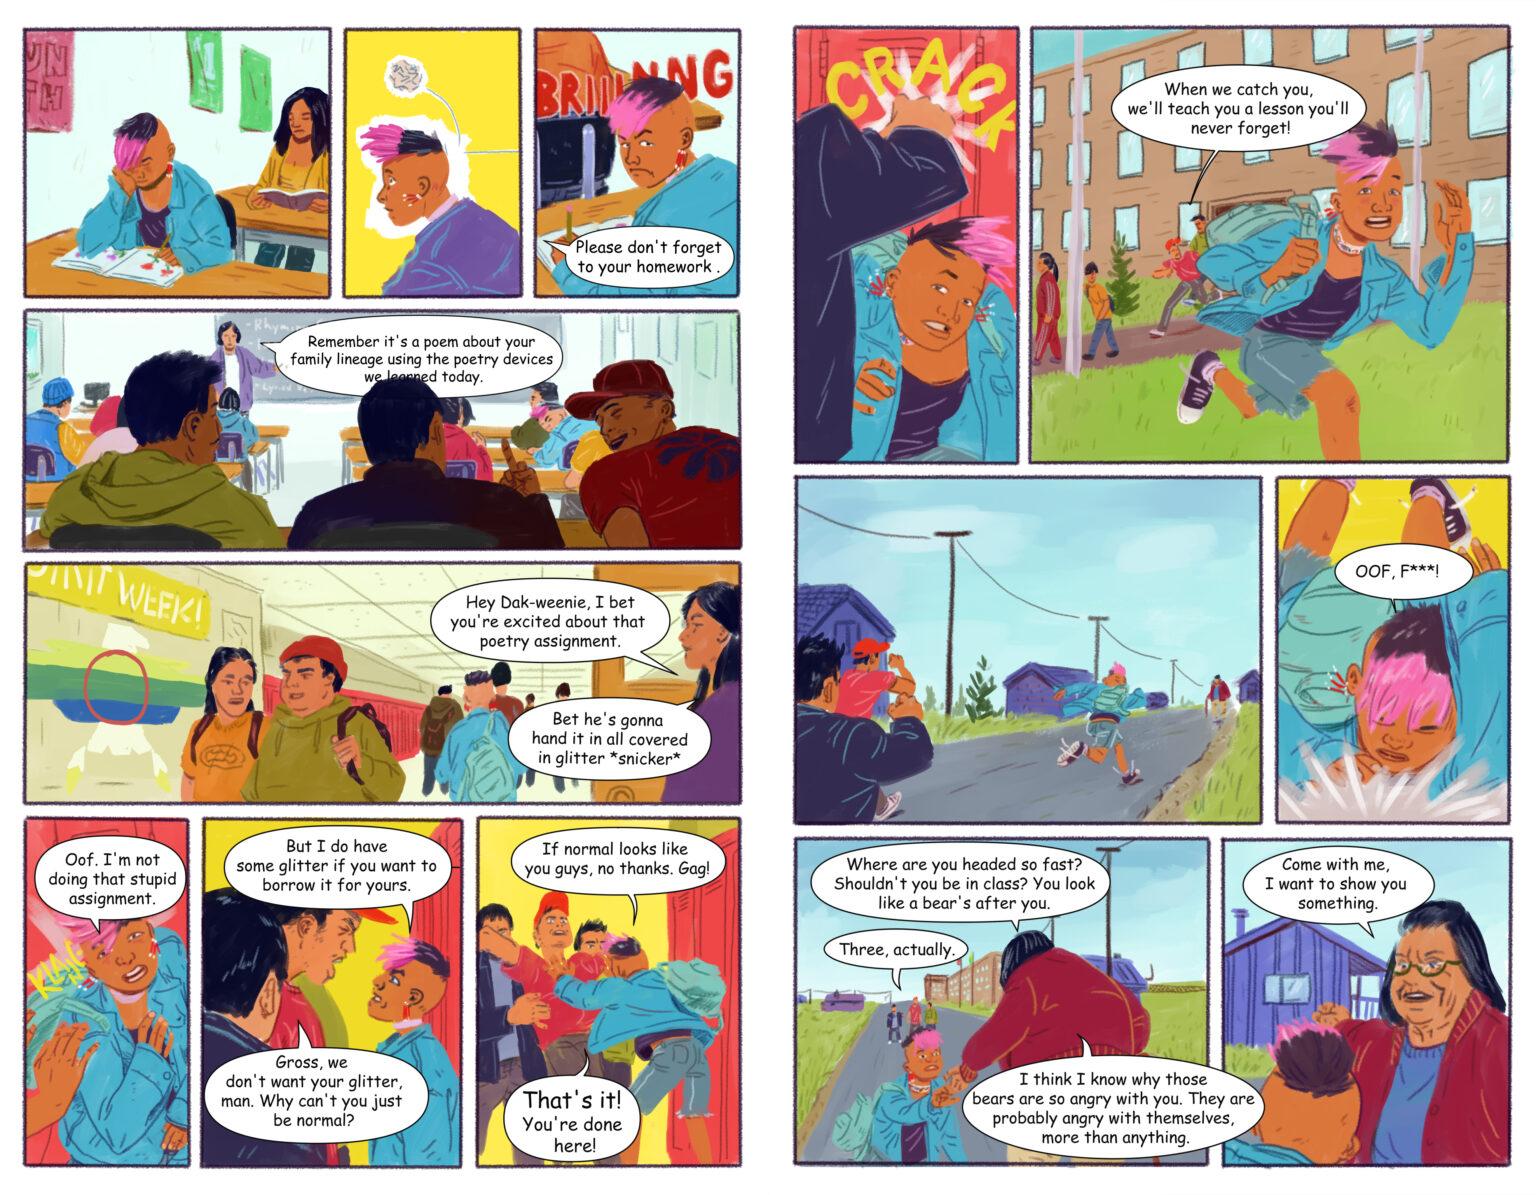 Internal comic pages of Splintered Spirits by Aranea Press